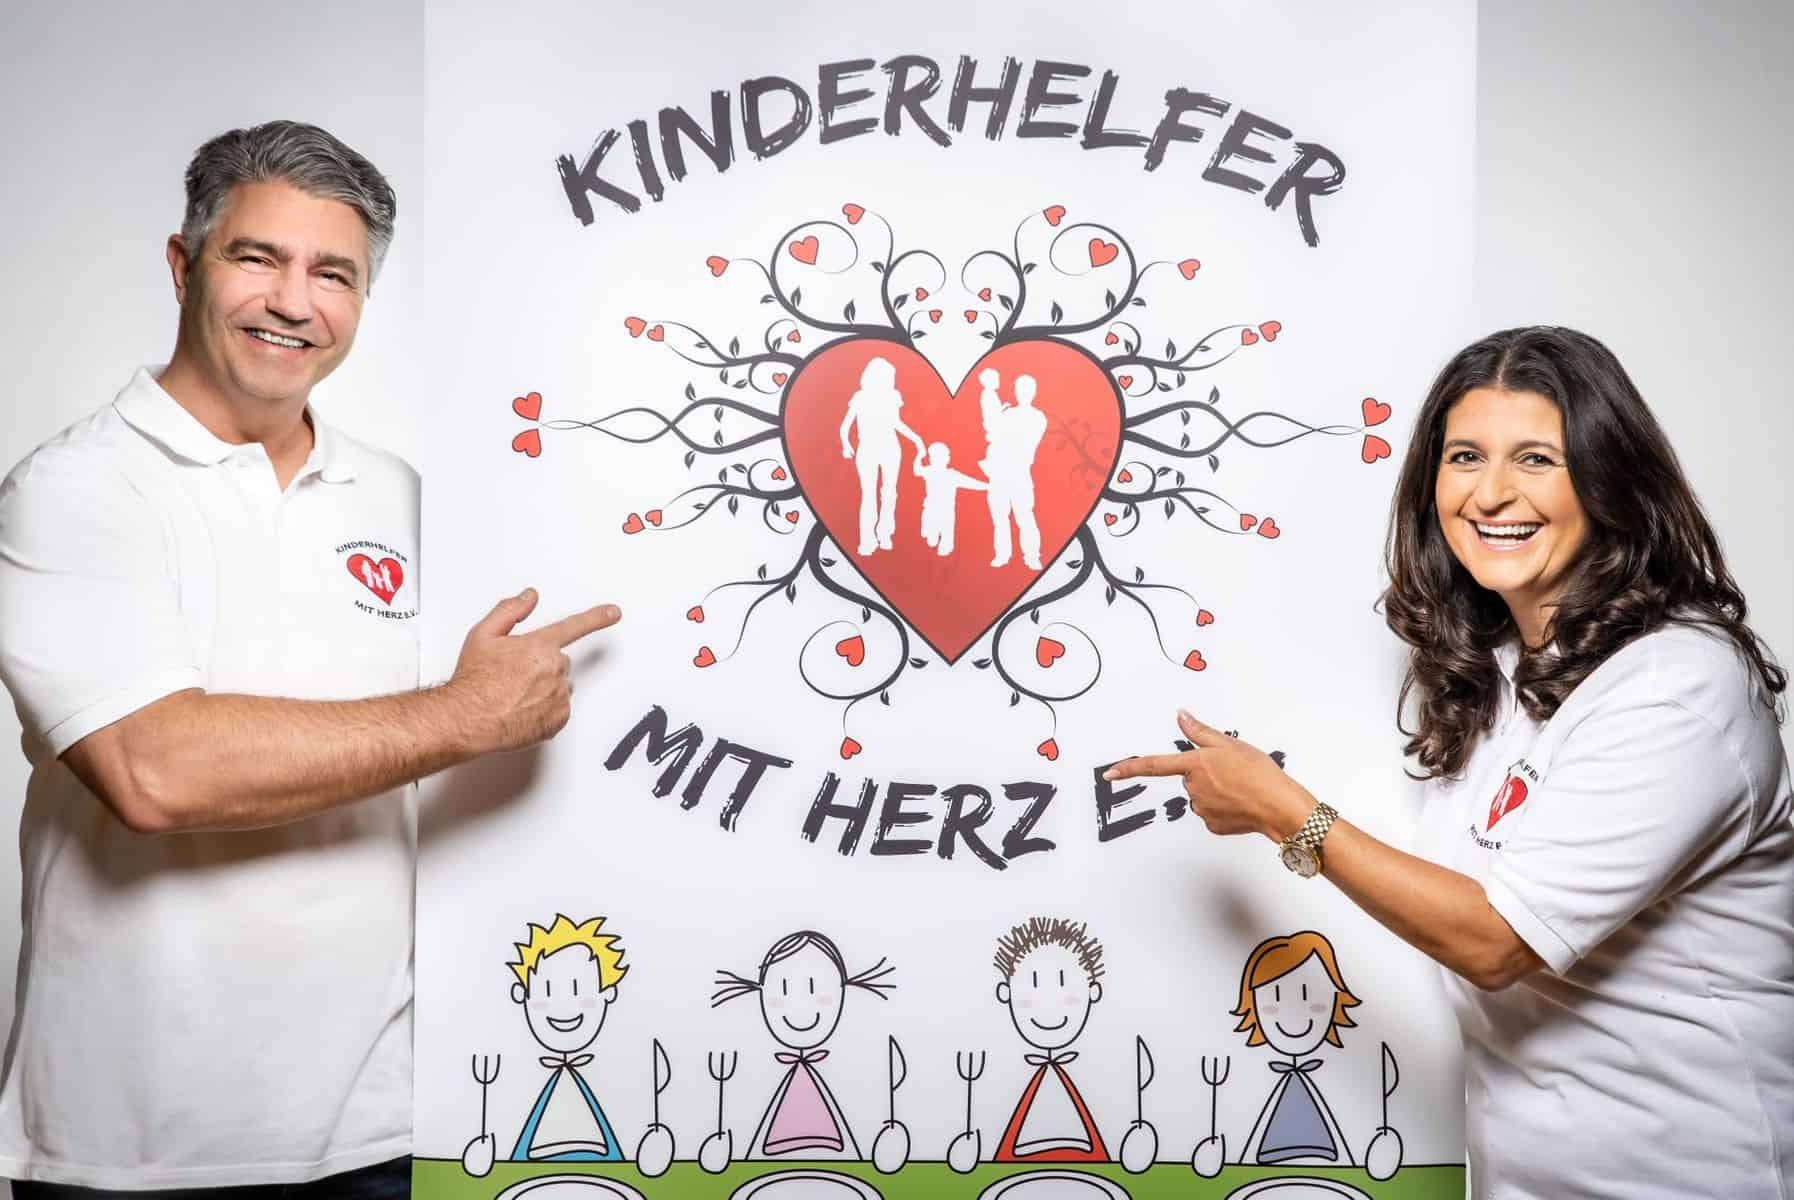 Ein starkes Team sind Christoph Kazmierczak und Claudia Smeets vom Kinderhelfer e.V.(Foto: Kinderhelfer)